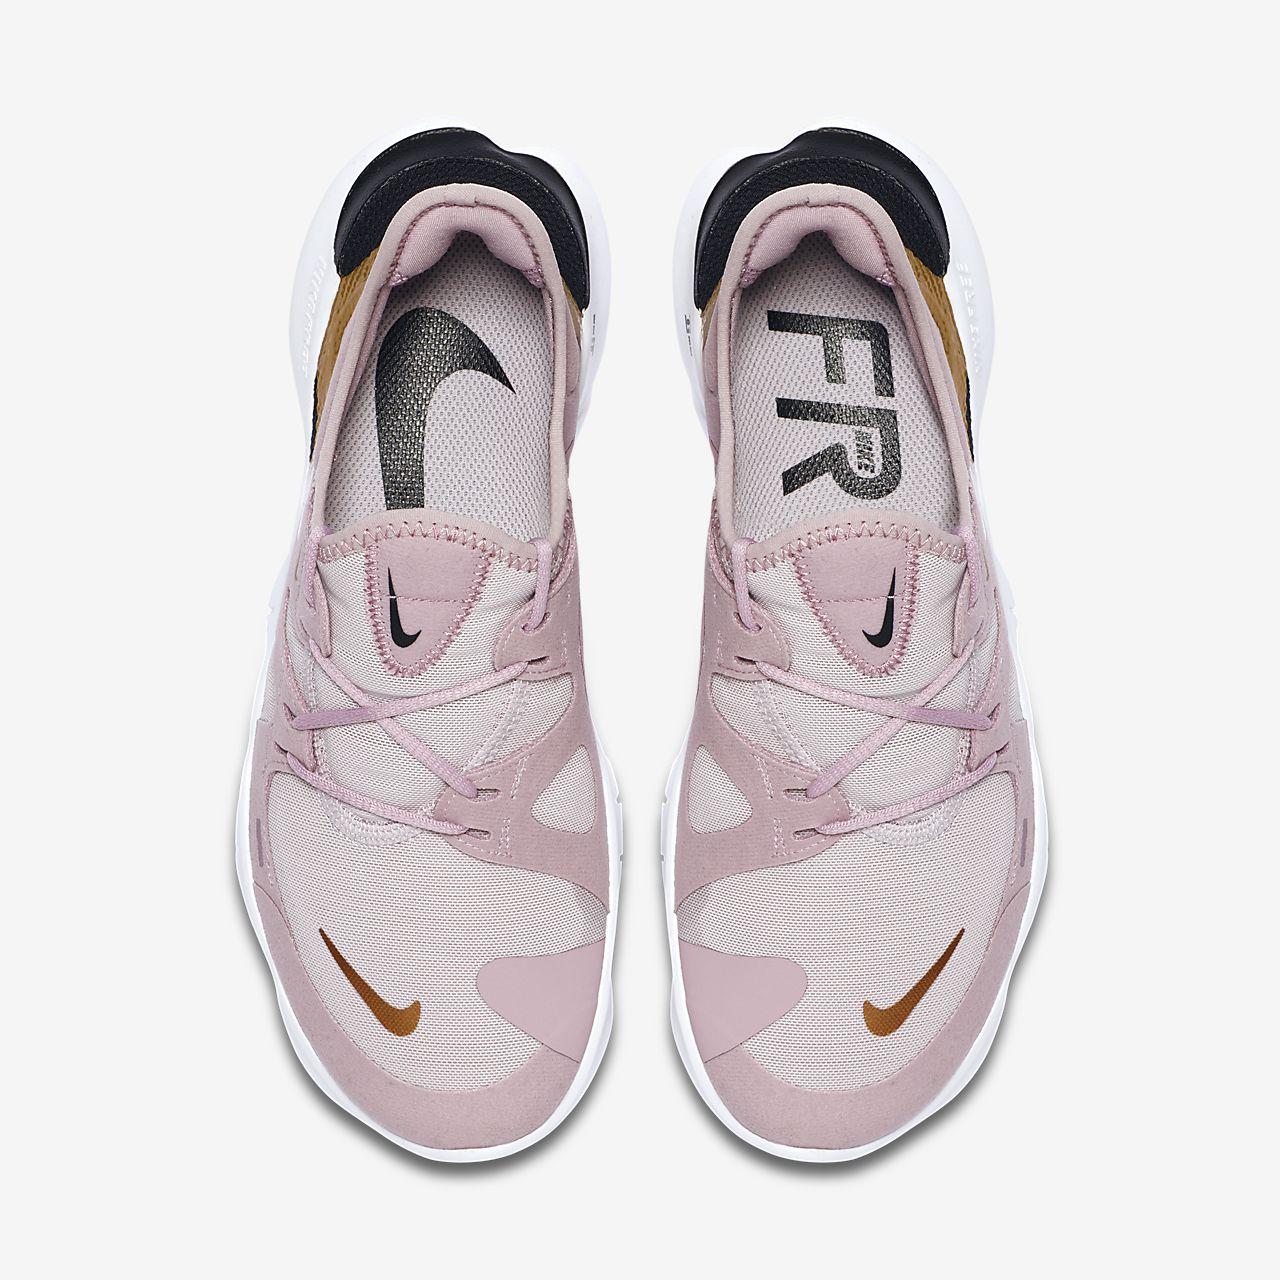 Billiga Nike Free 5.0 Barn(9 13) | Nike Free 5.0 Löparskor